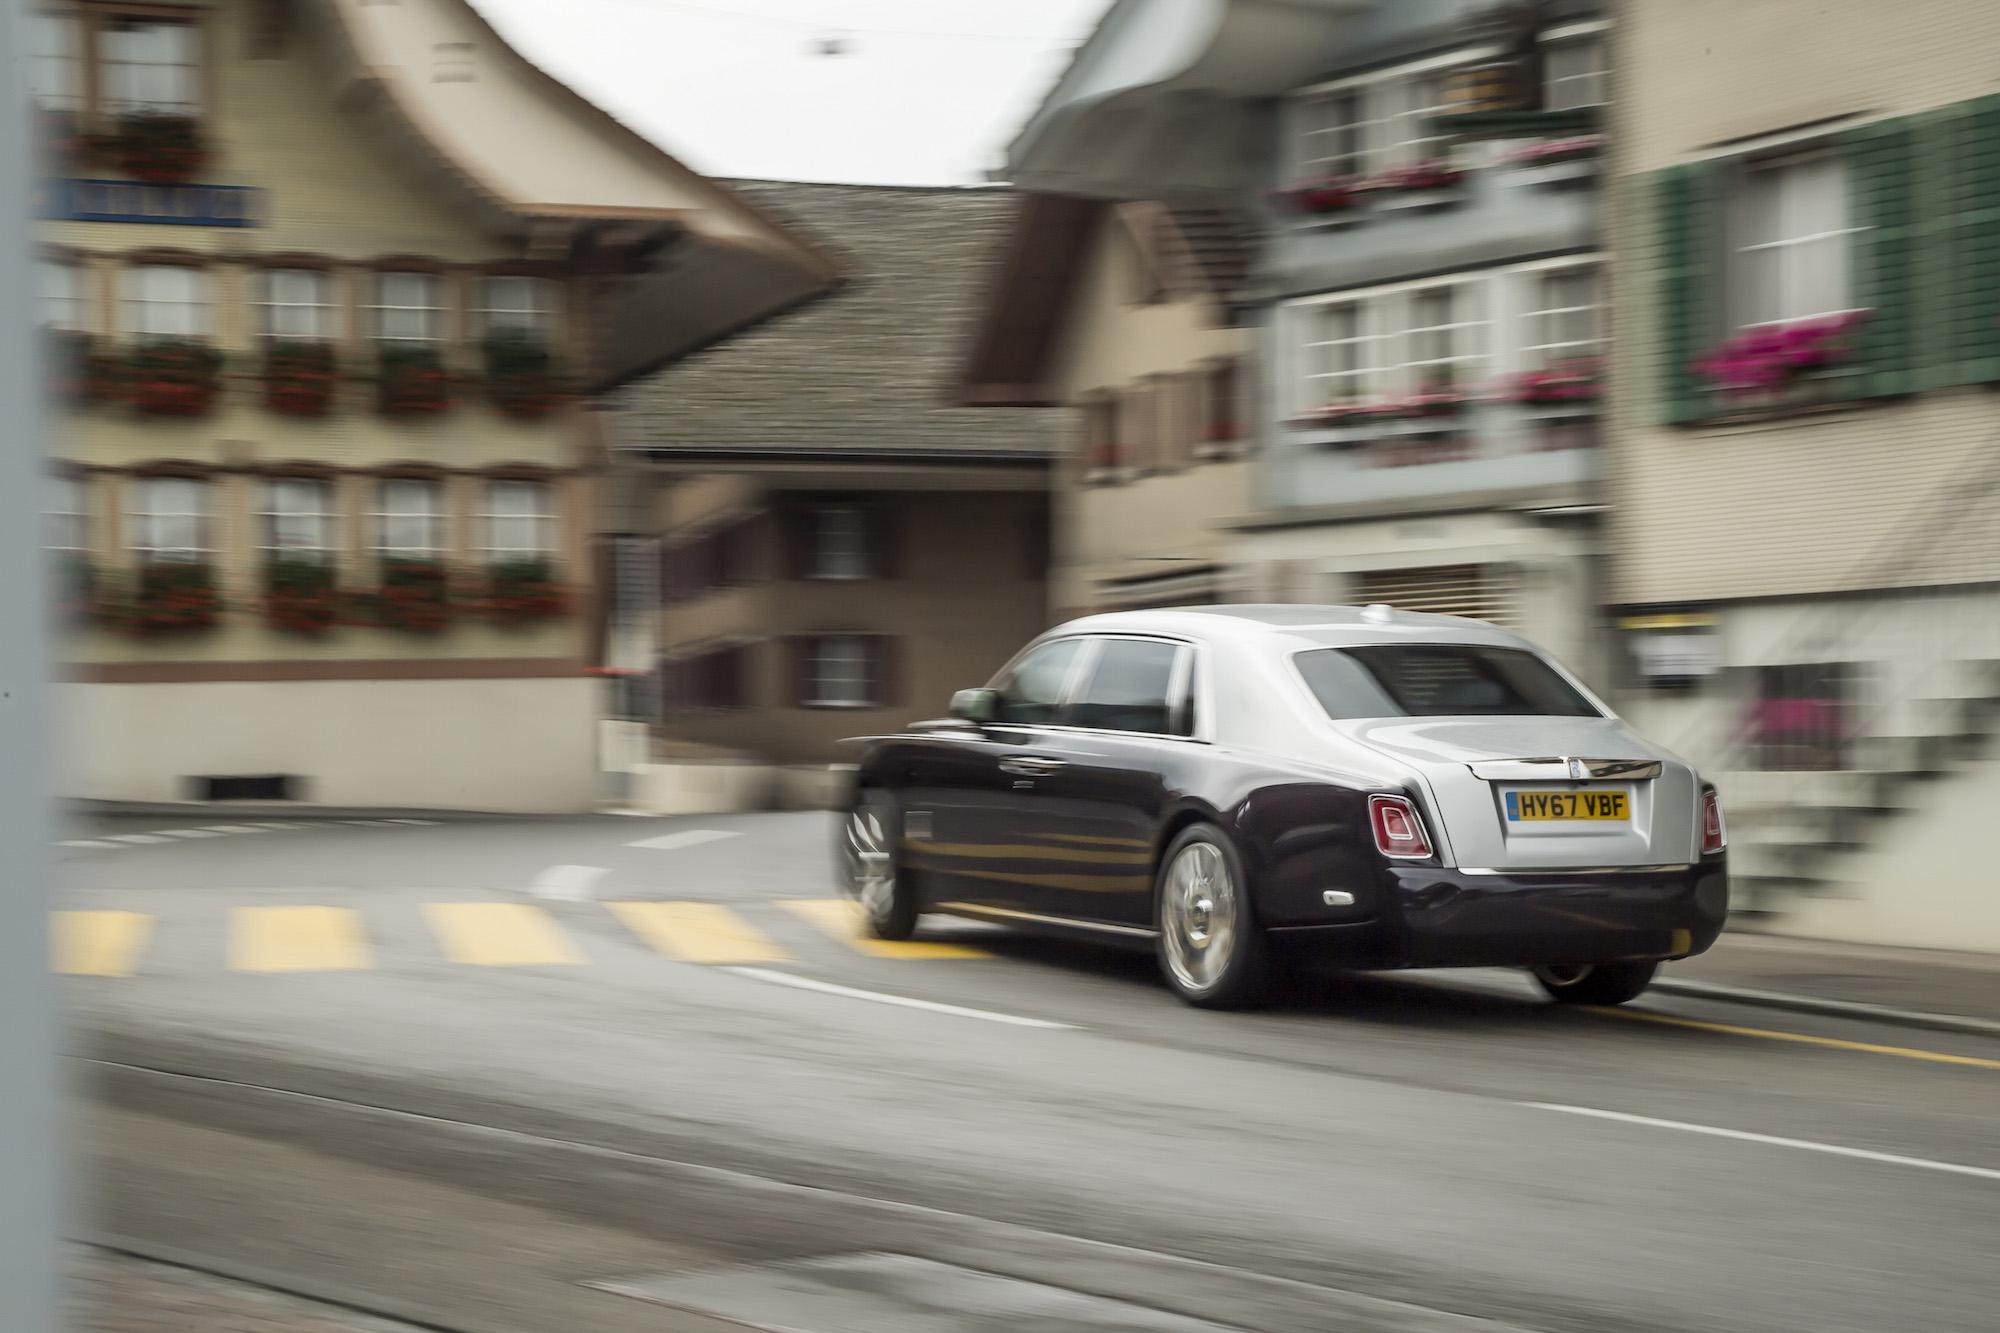 Customize Your Car Online >> First Look: 2018 Rolls-Royce Phantom VIII | Canadian Auto ...